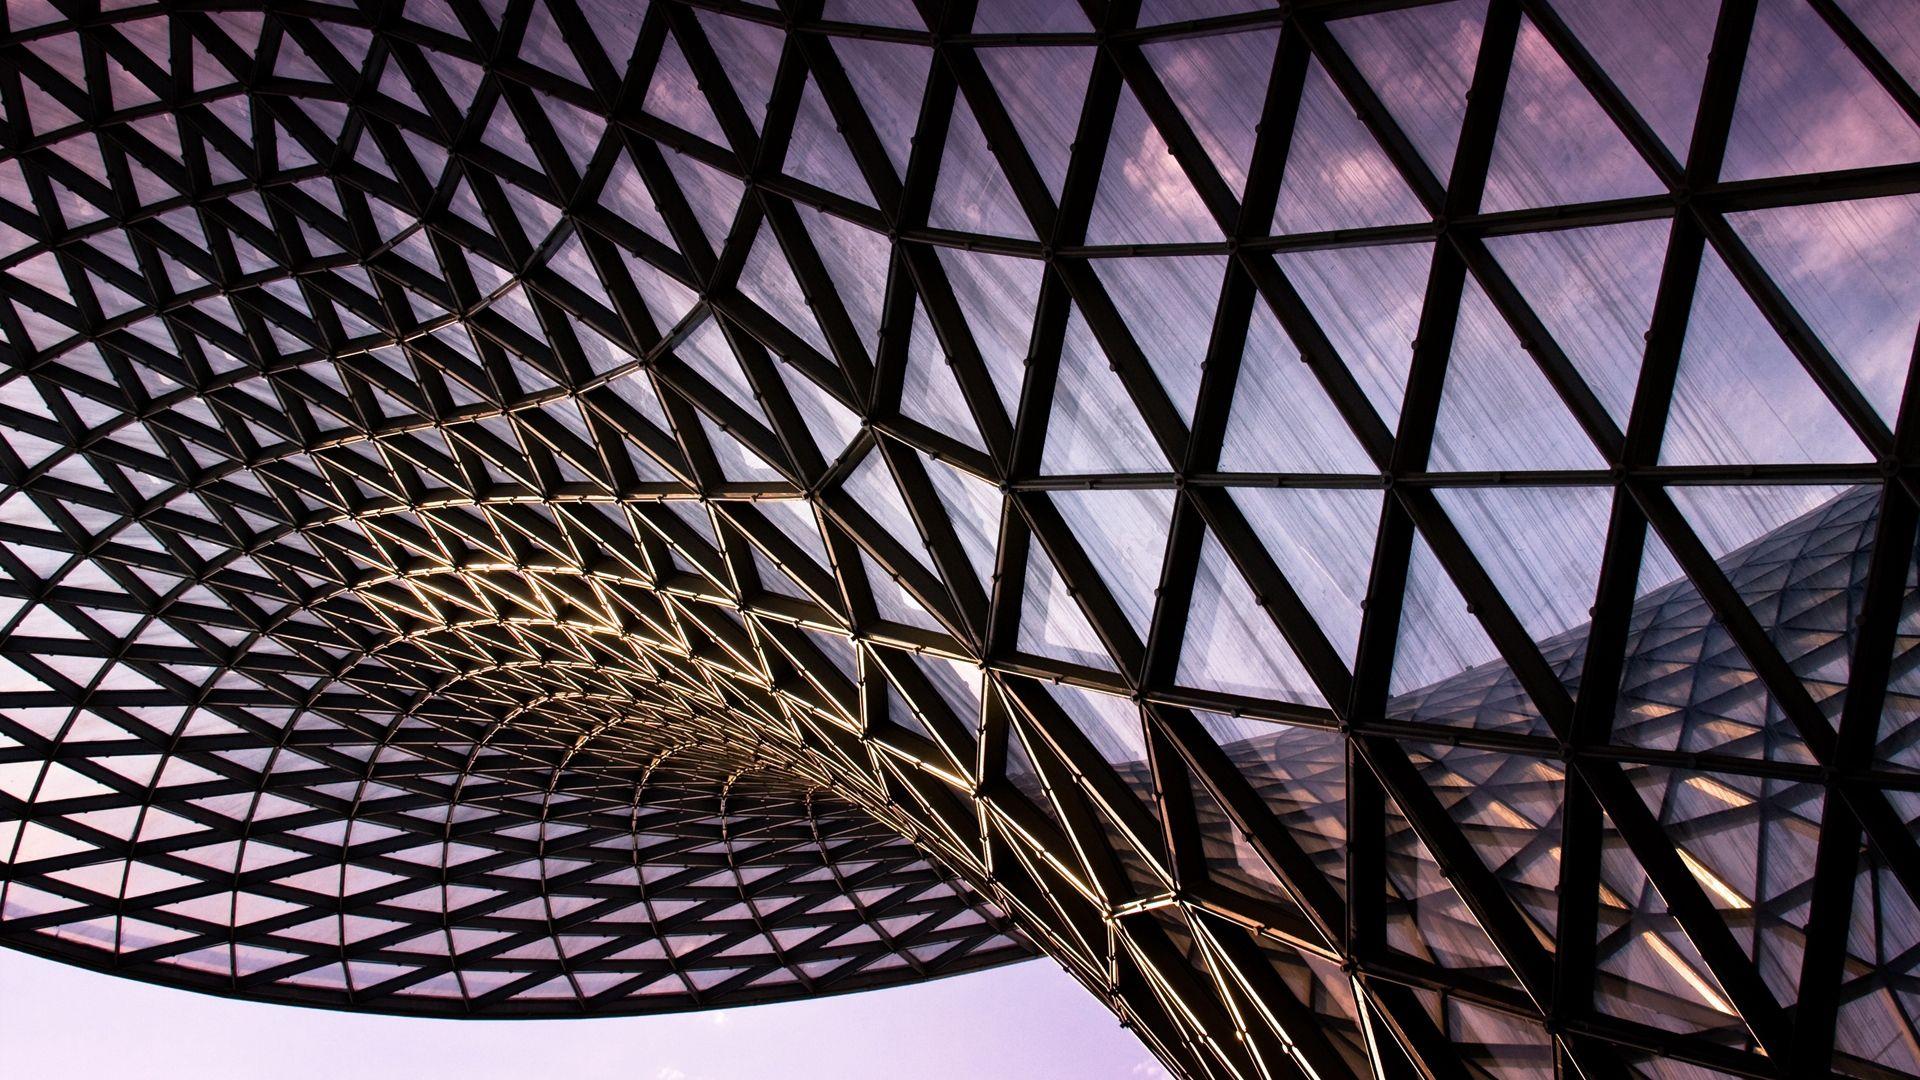 Architecture full hd wallpaper download